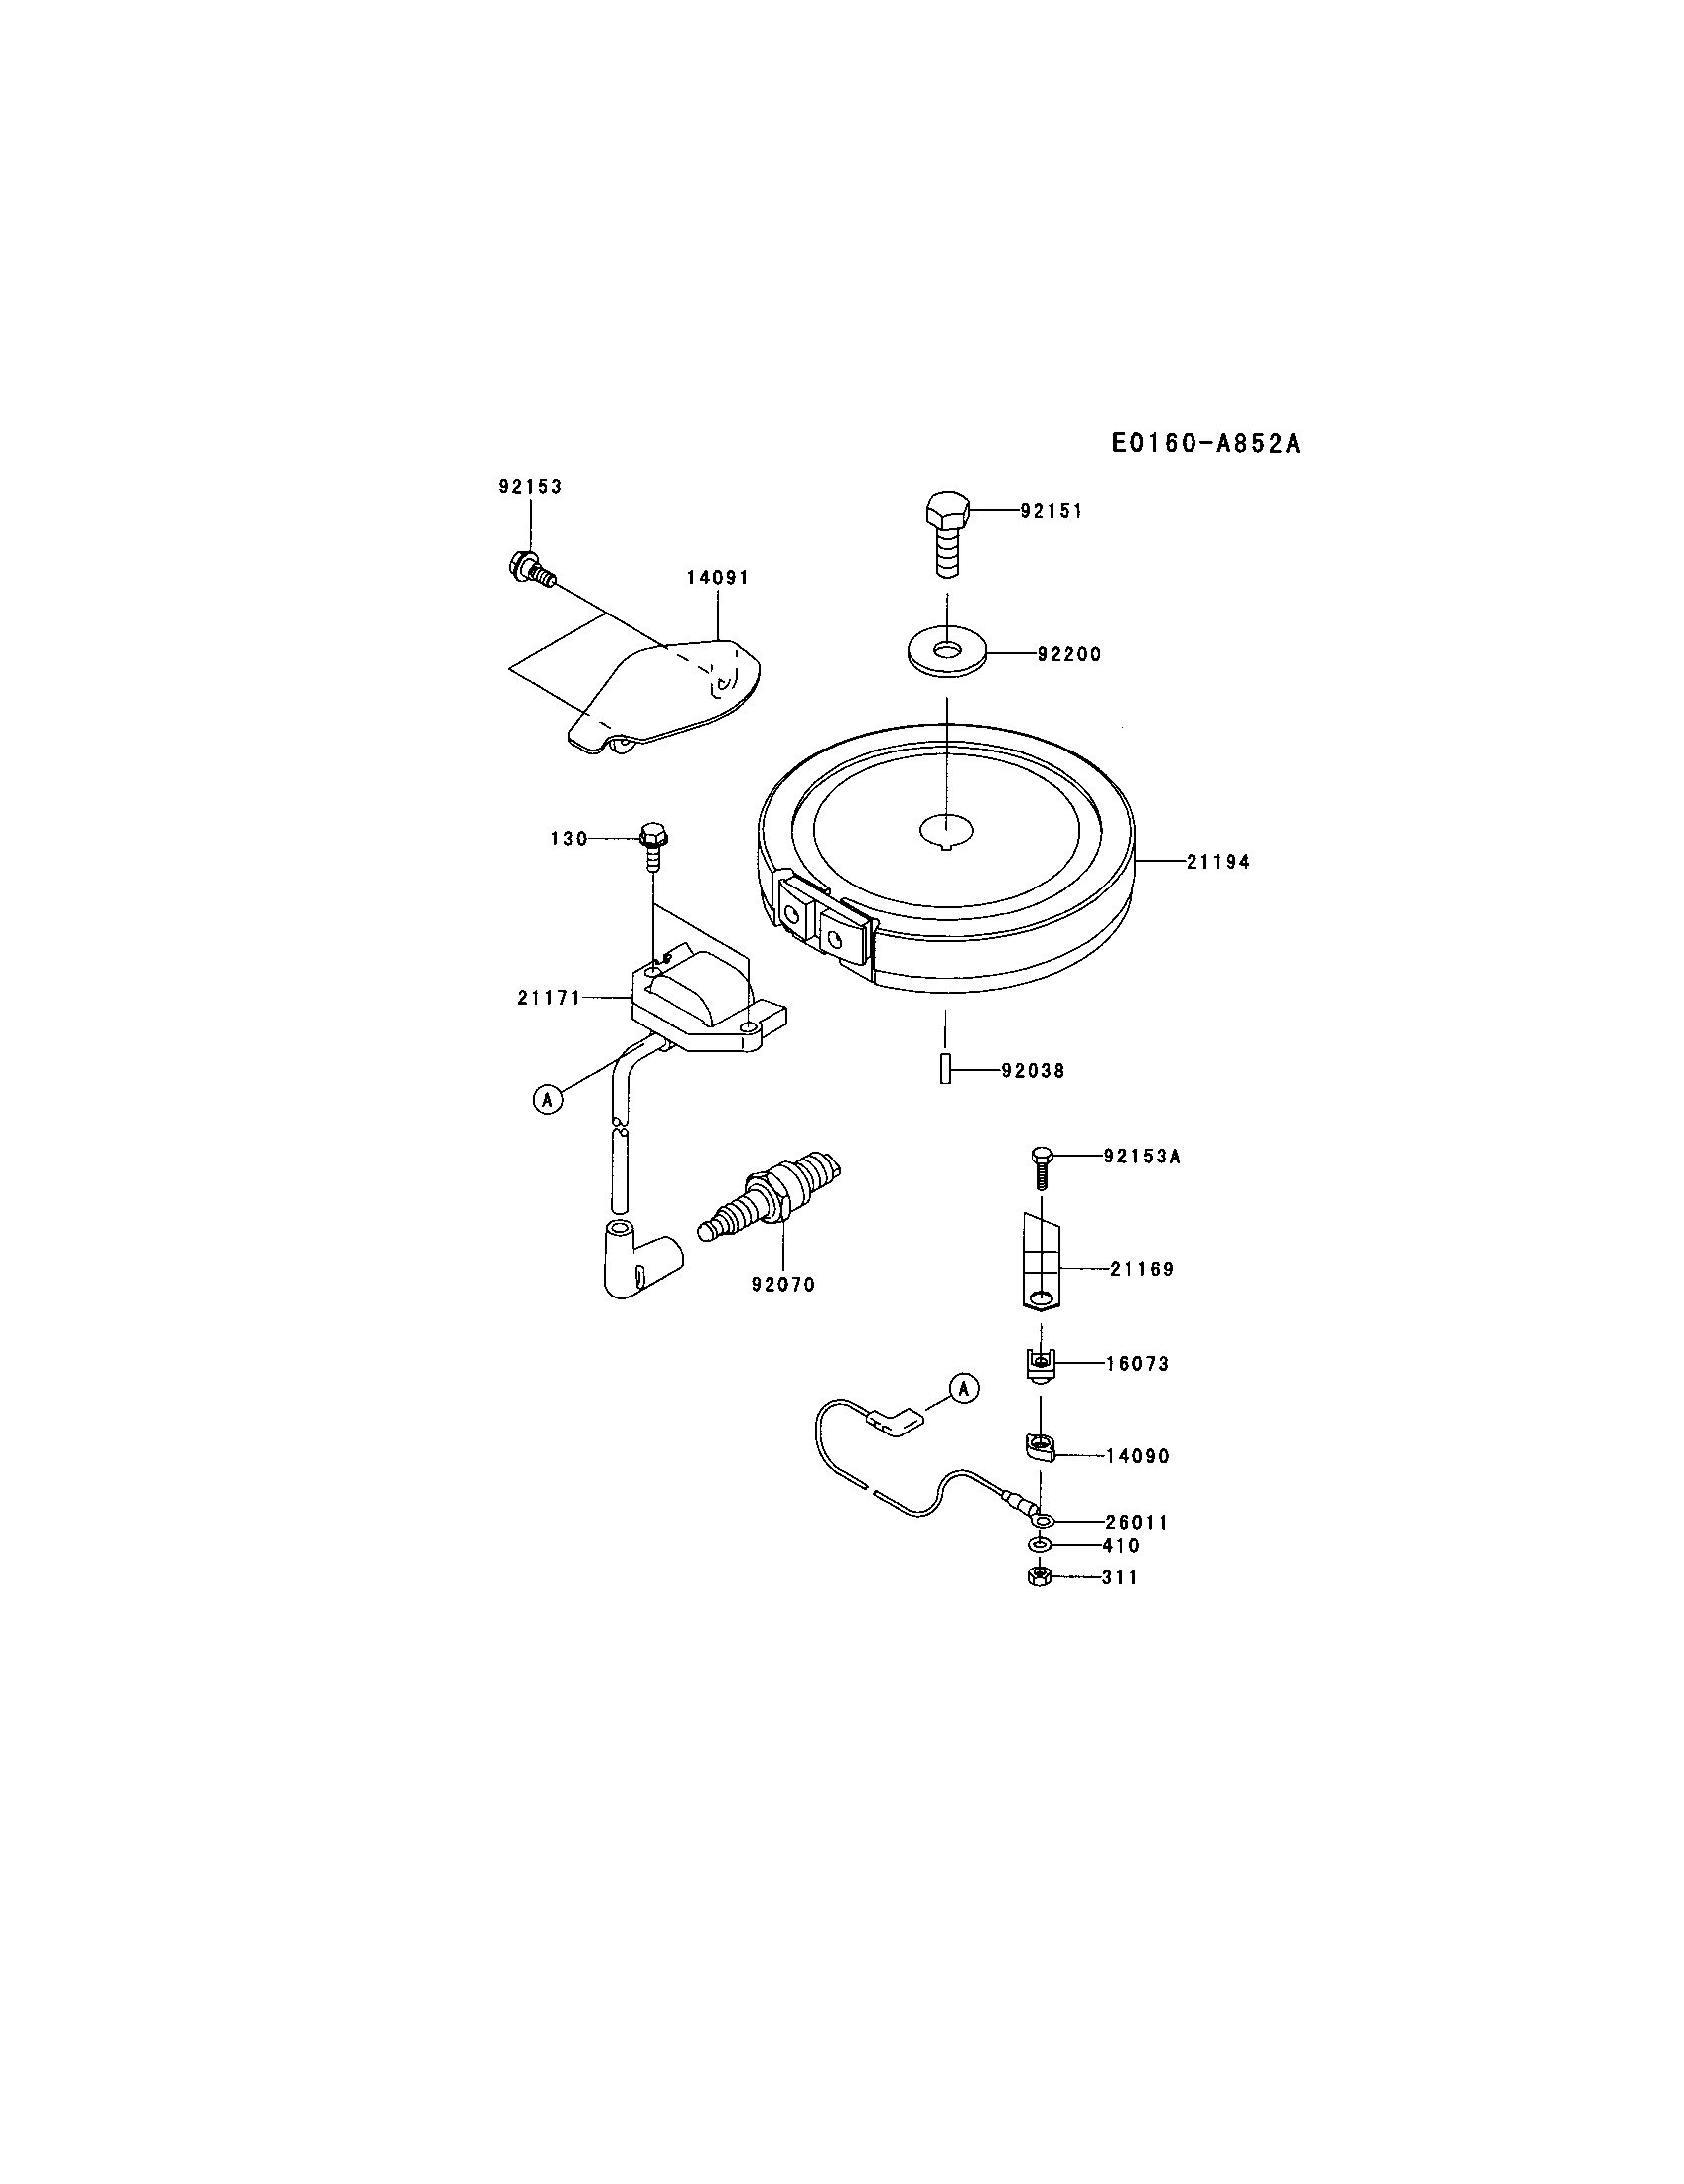 Kawasaki model FJ180V-BS04 engine genuine parts